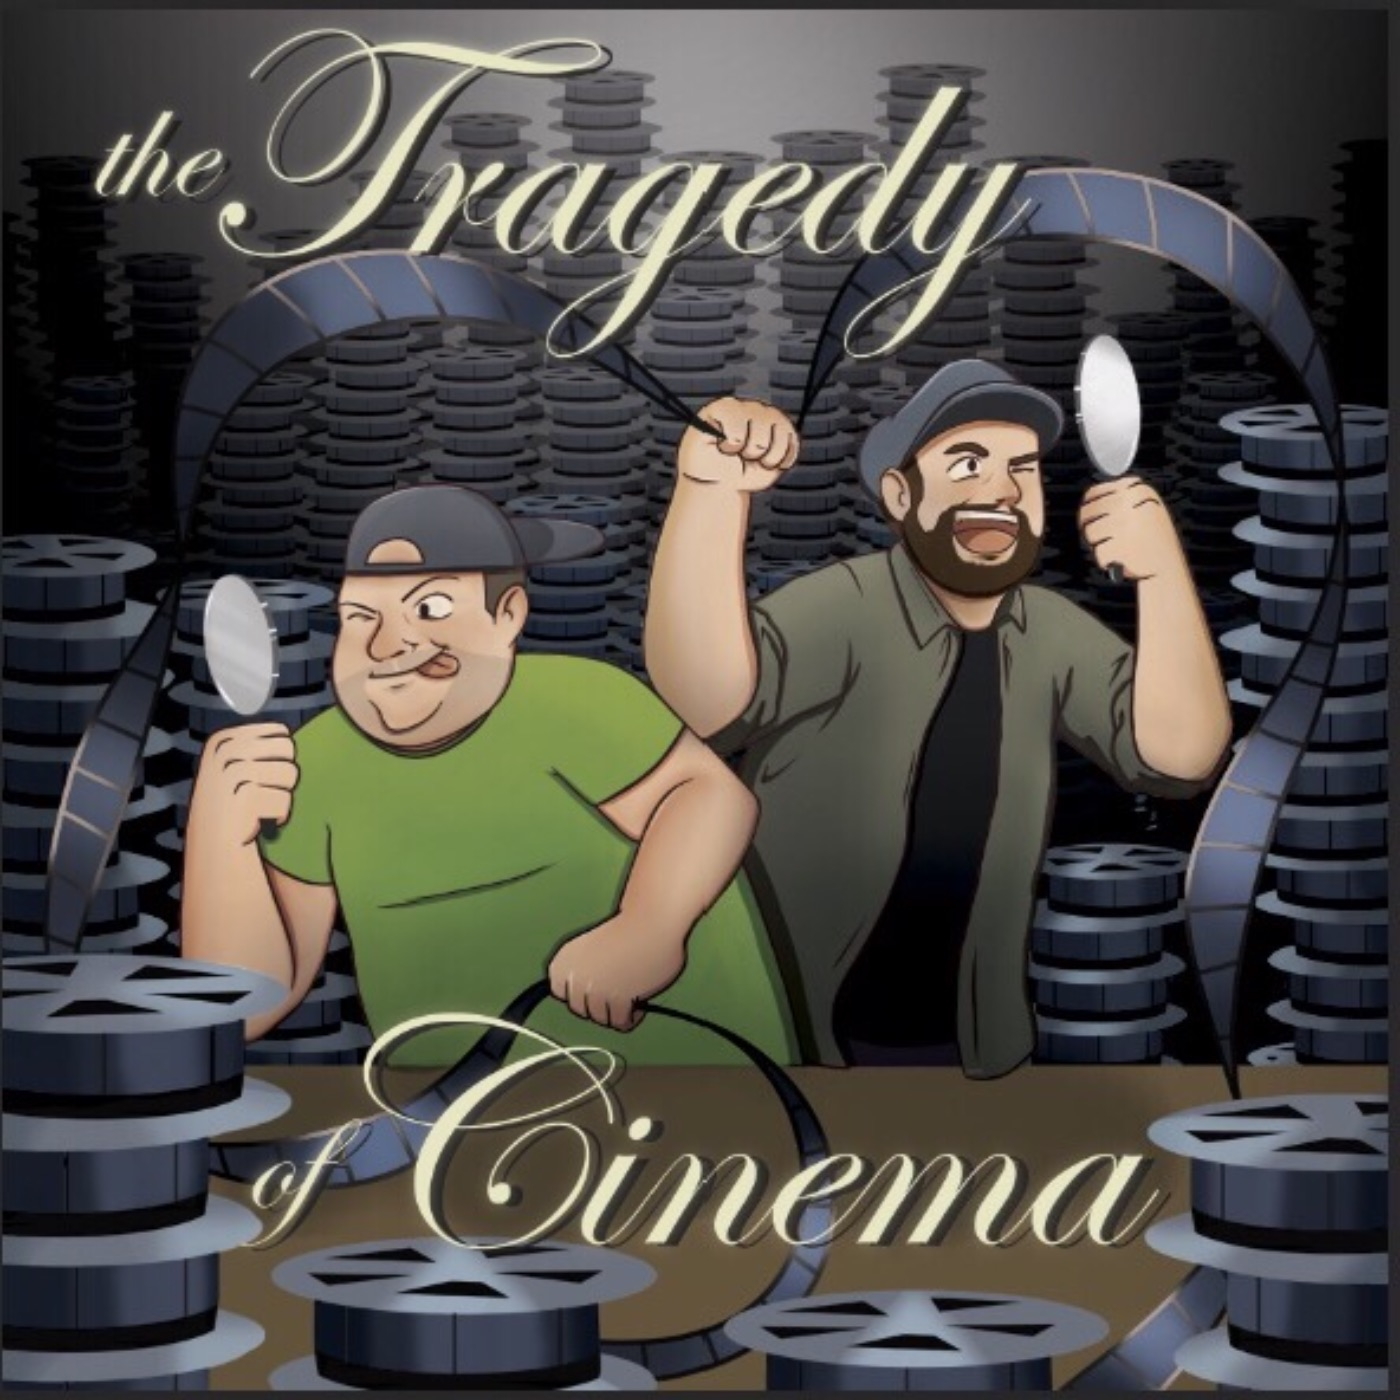 The Tragedy of Cinema